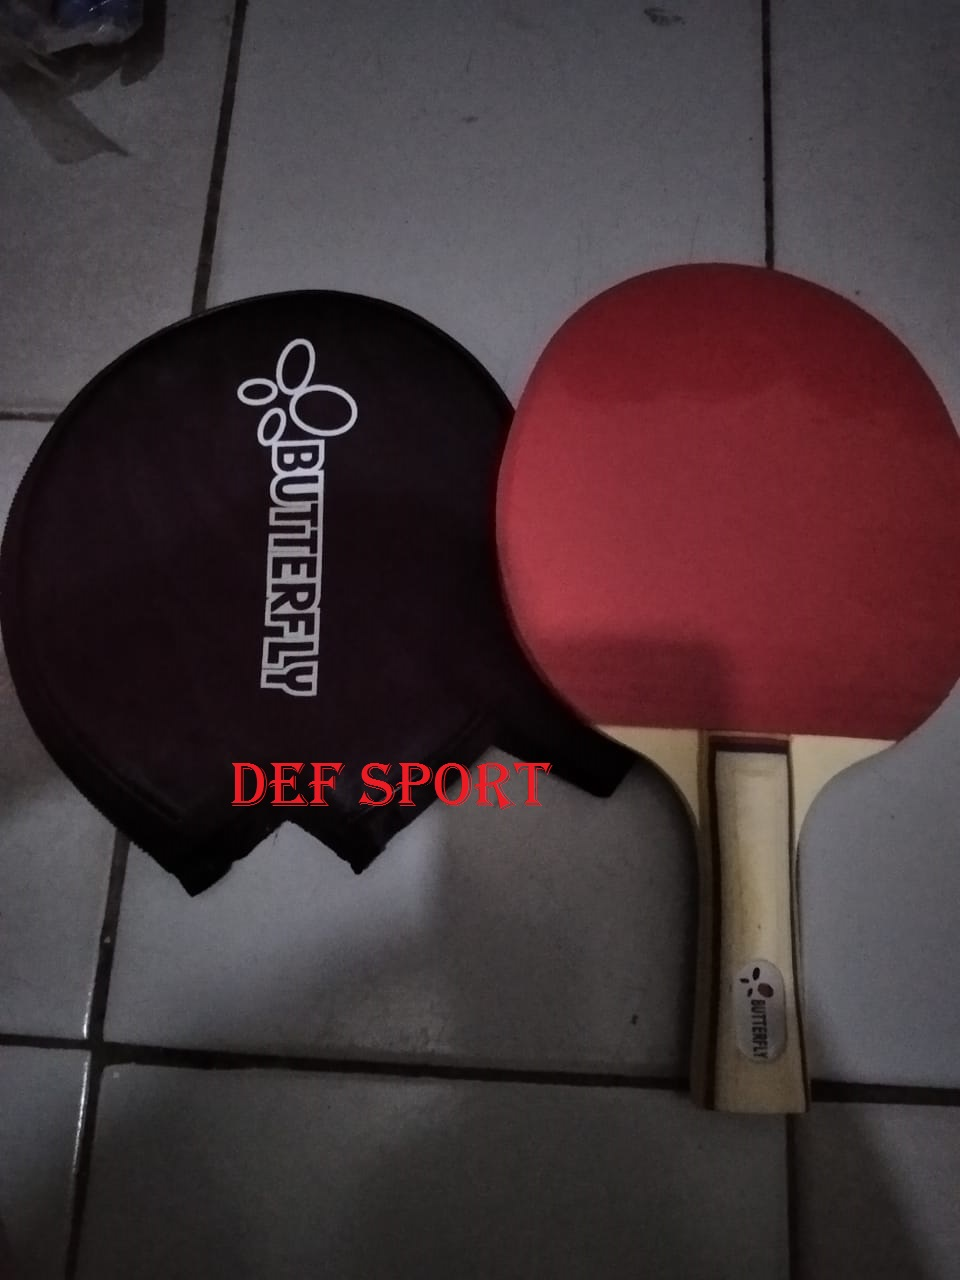 Ukuran Bet Tenis Meja : ukuran, tenis, Produk, Termurah, SPORT, Buterfly, Ping-Pong, Tenis, Tennis, Butterfly, Lazada, Indonesia